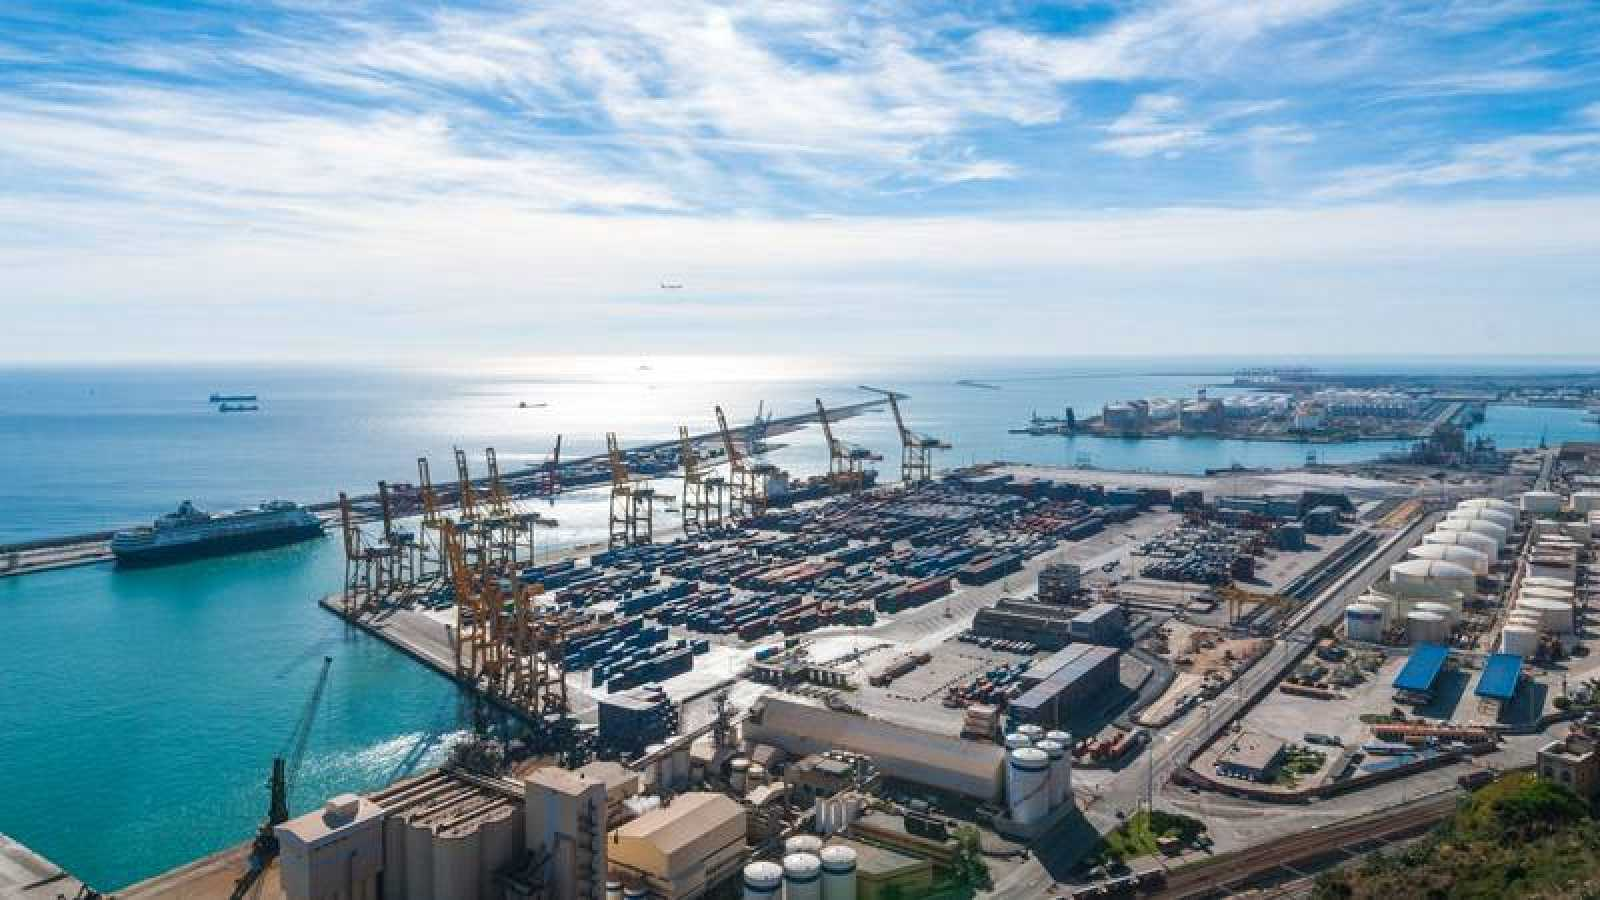 Vista aérea del puerto de Barcelona